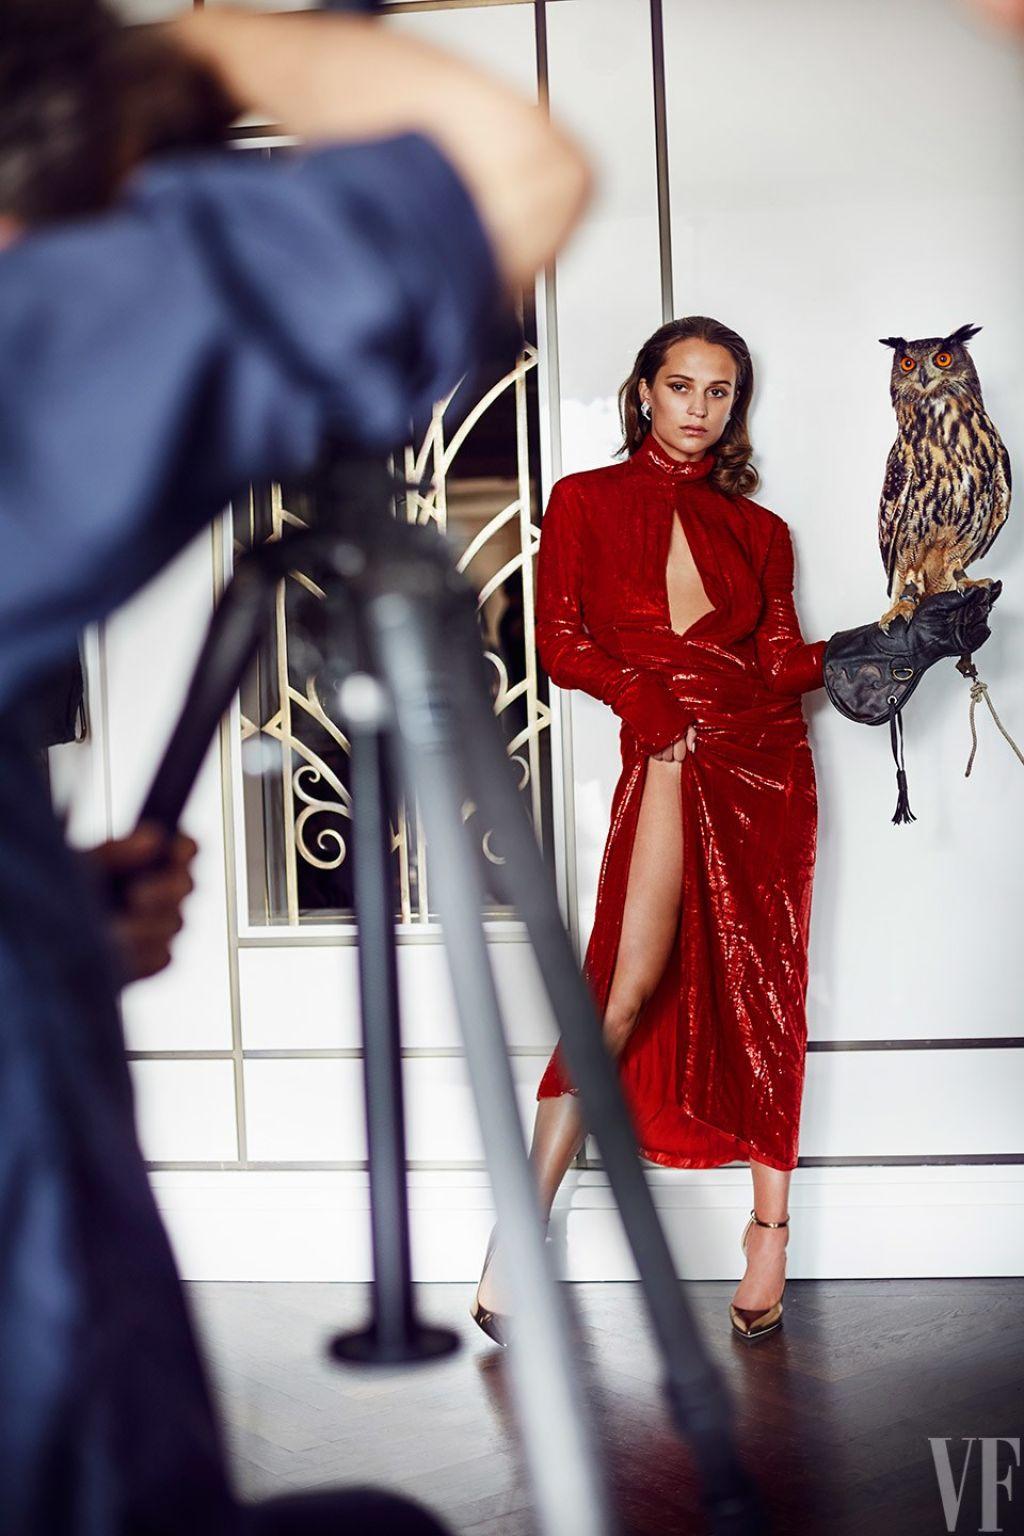 Alicia Vikander Photoshoot Amp Bts For Vanity Fair September 2016